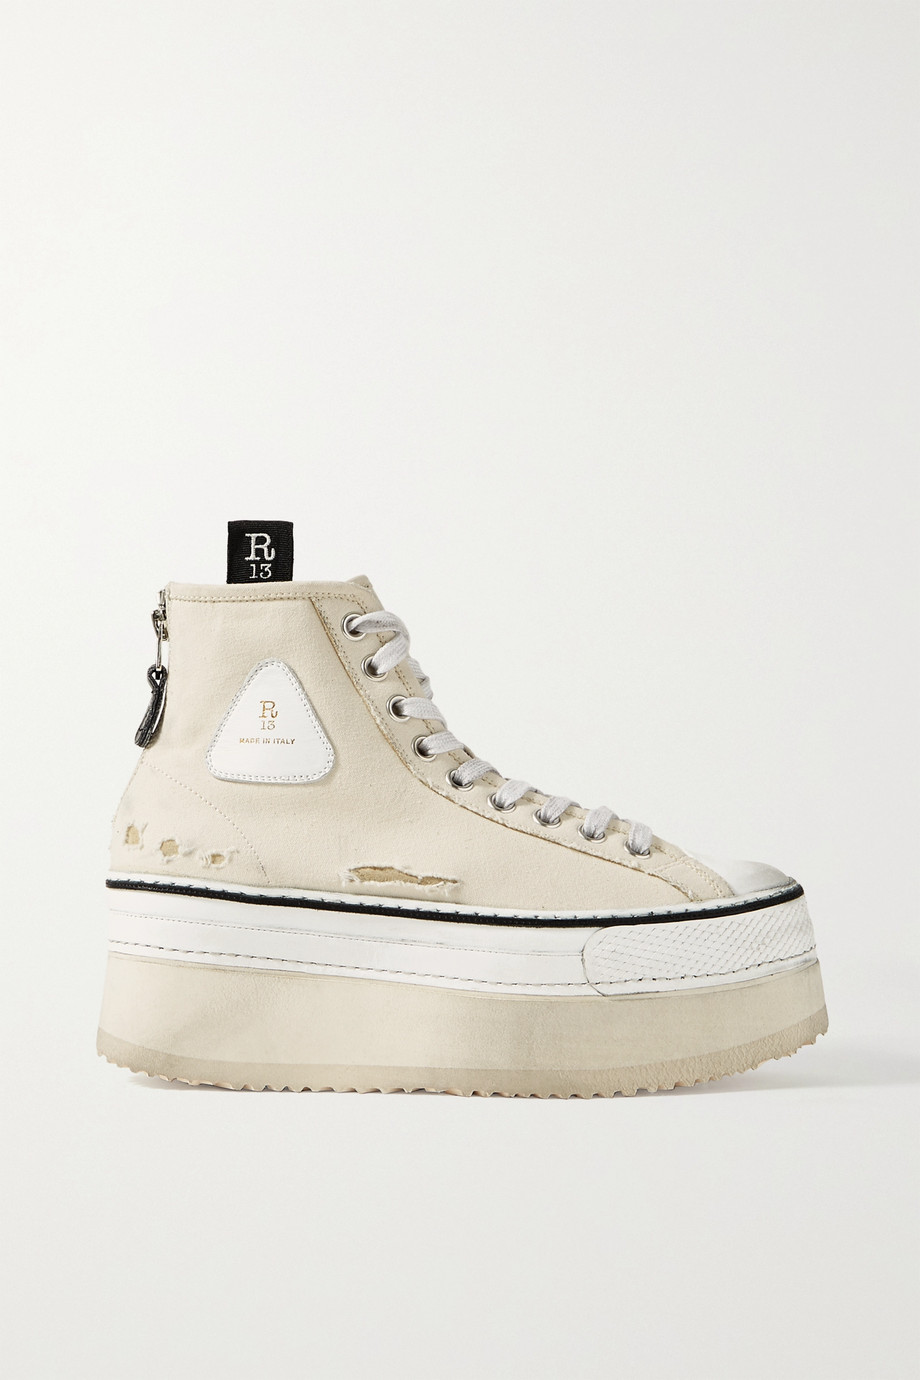 R13 Grosgrain-trimmed distressed canvas platform high-top sneakers